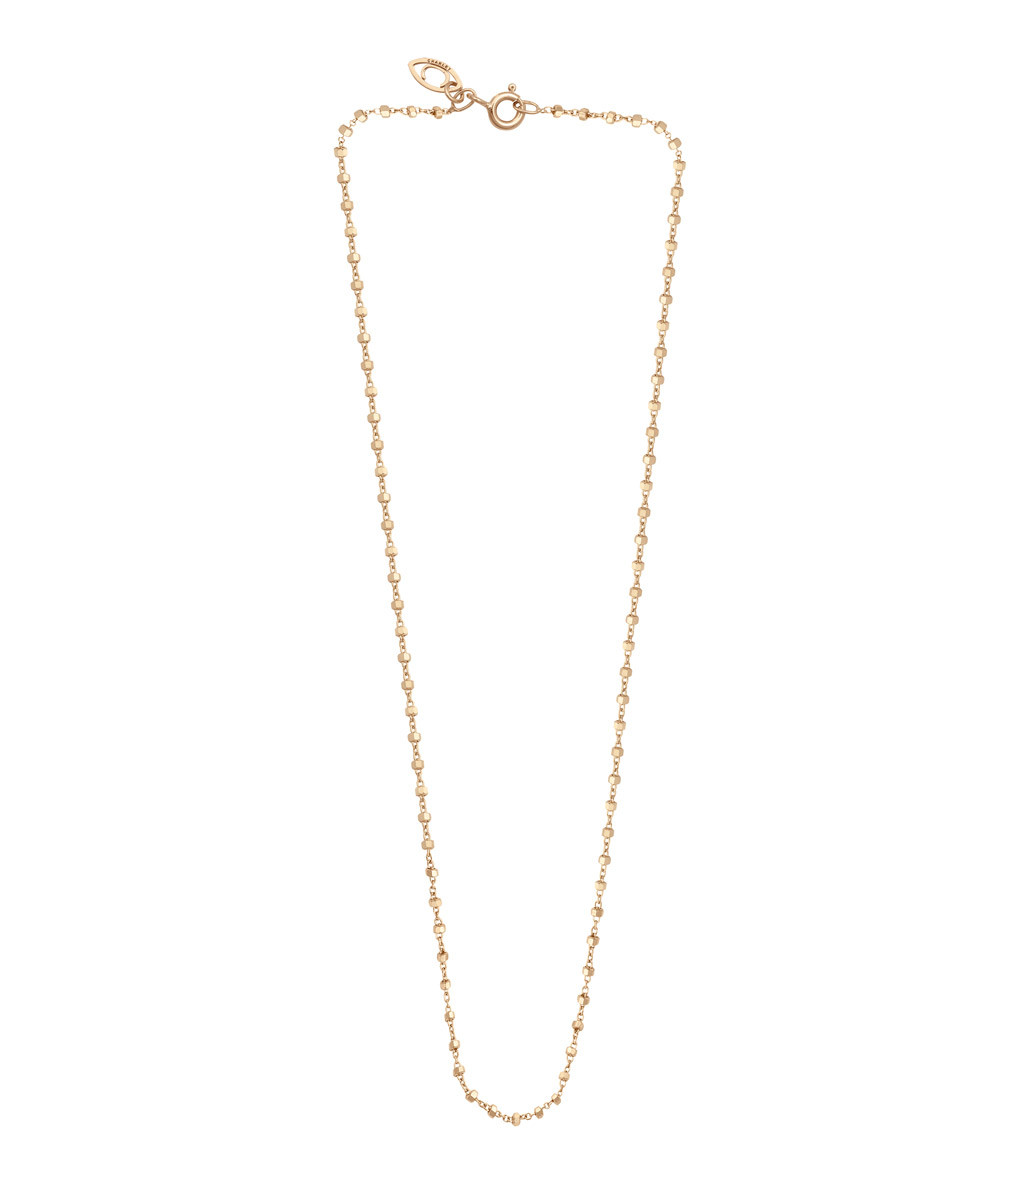 Chaîne Diamantée 40cm - CHARLET